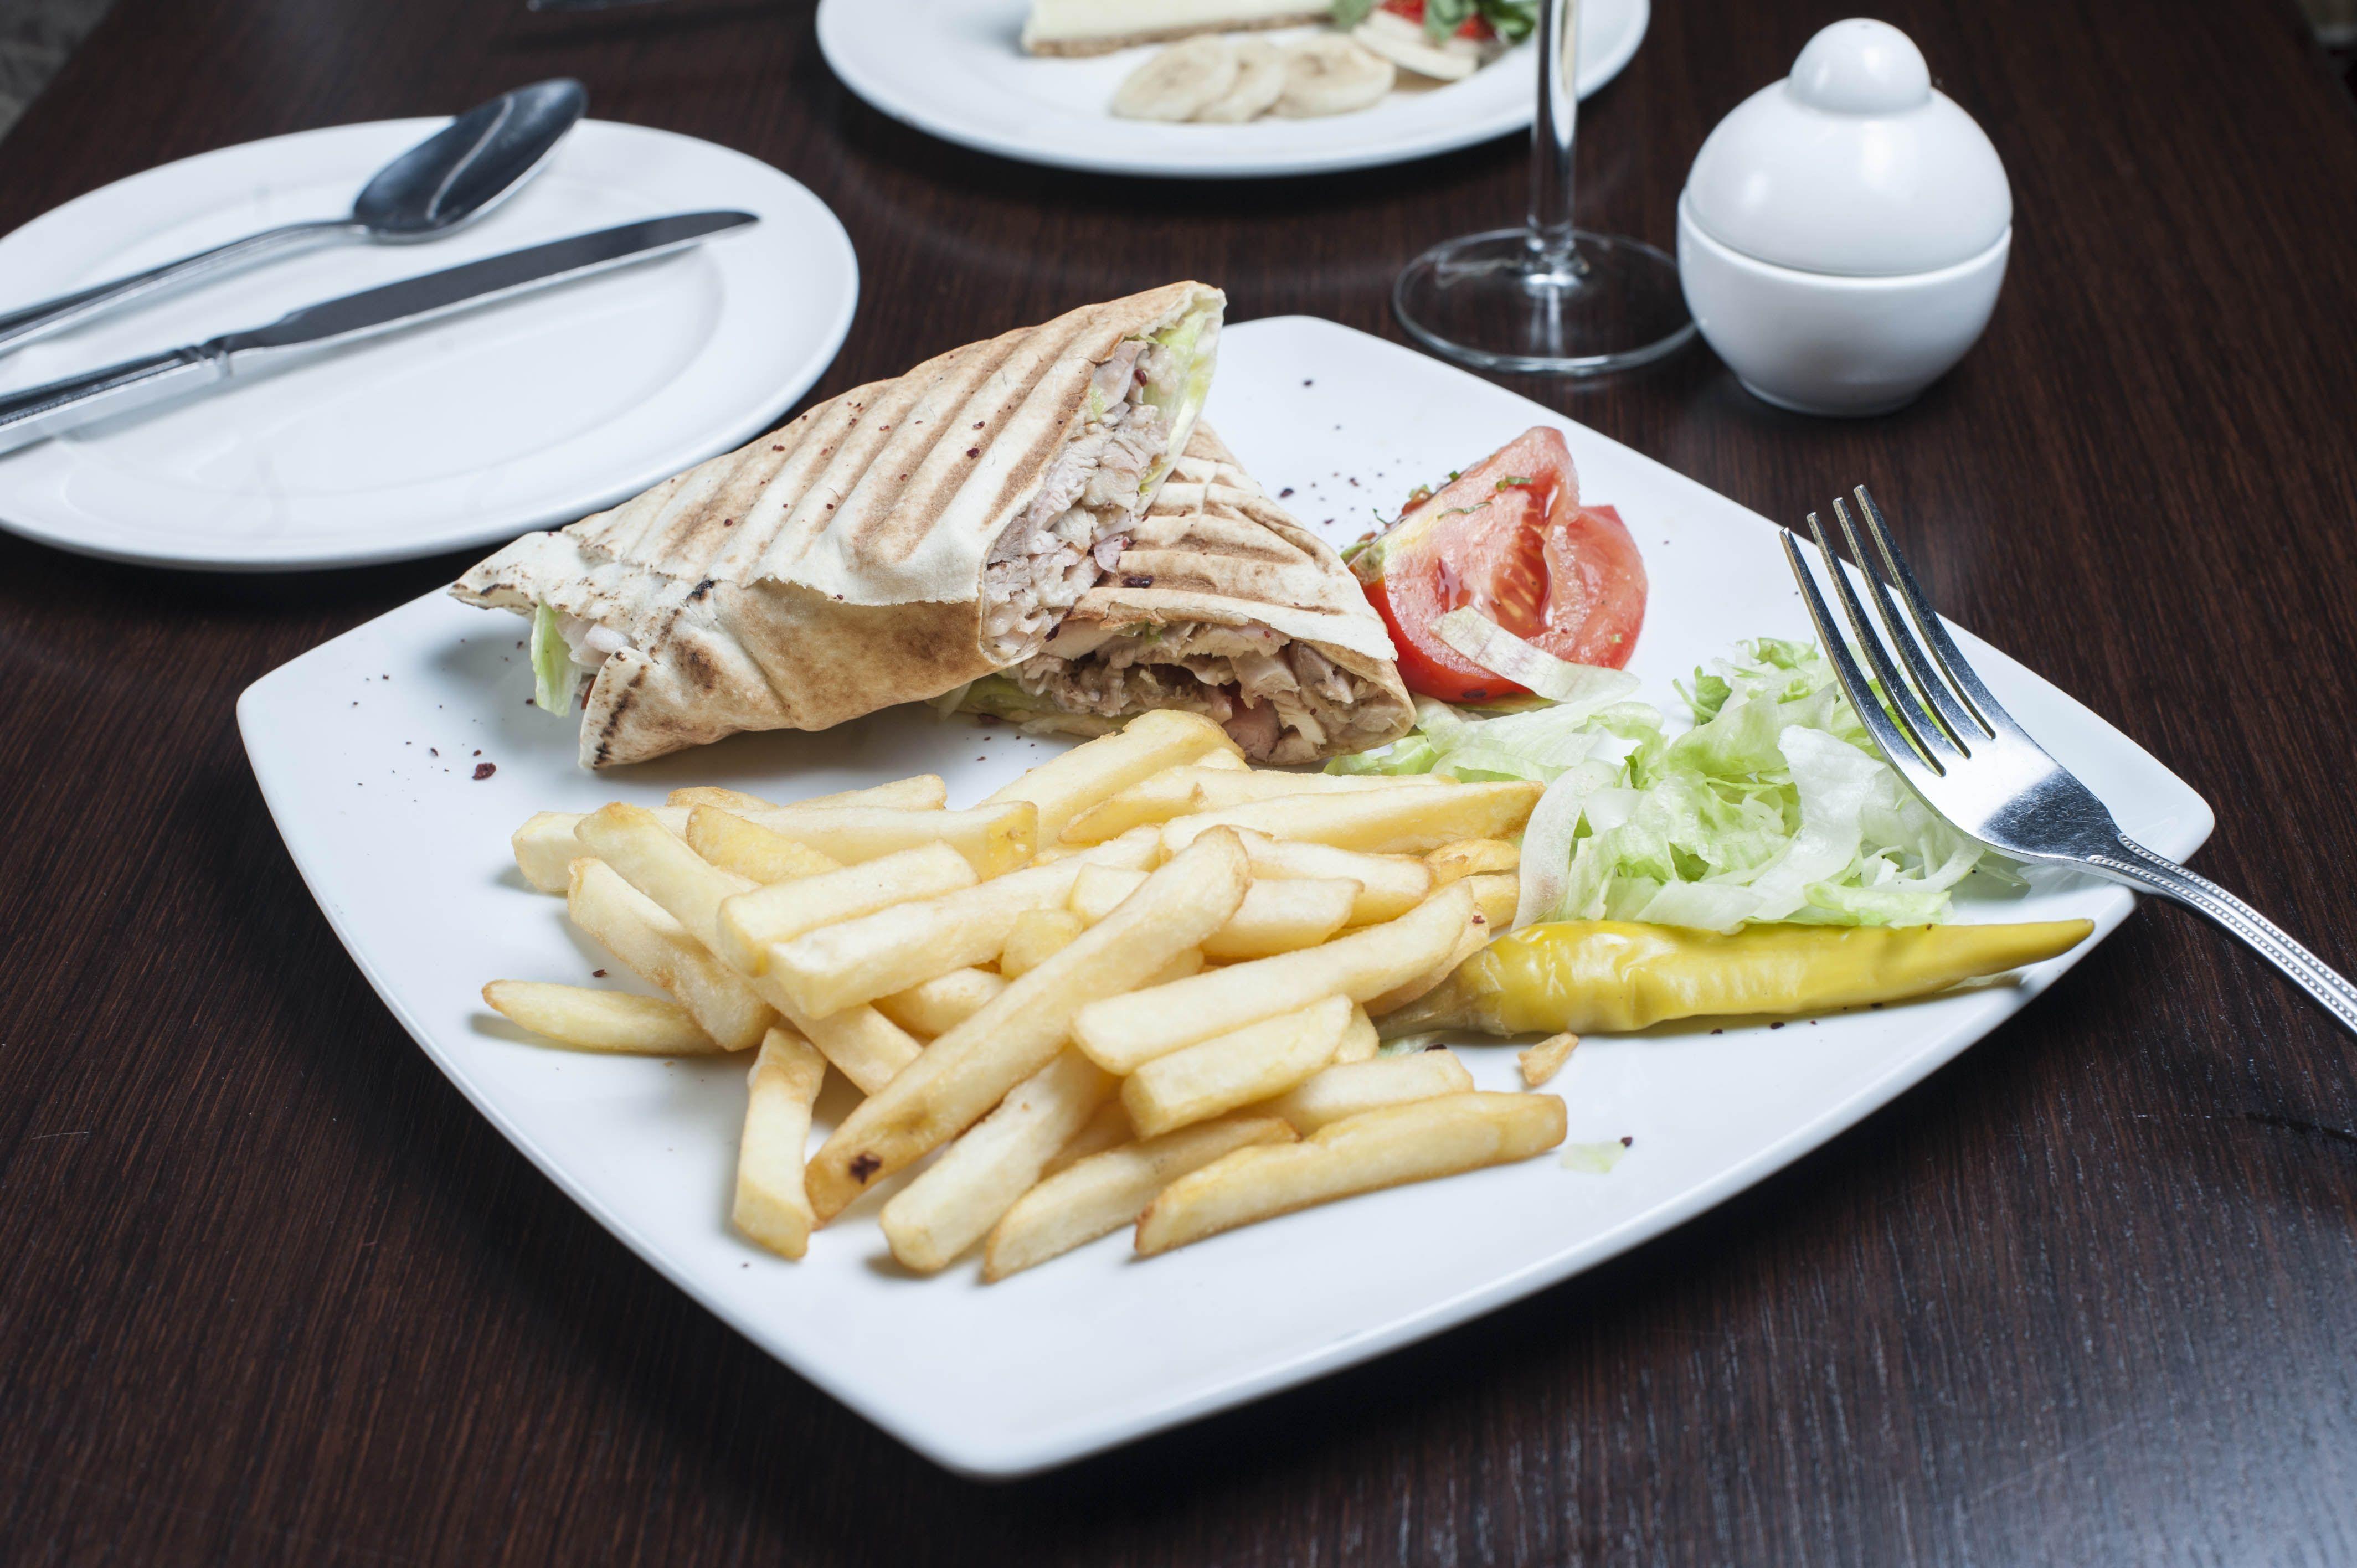 Sandwiches - Soujok